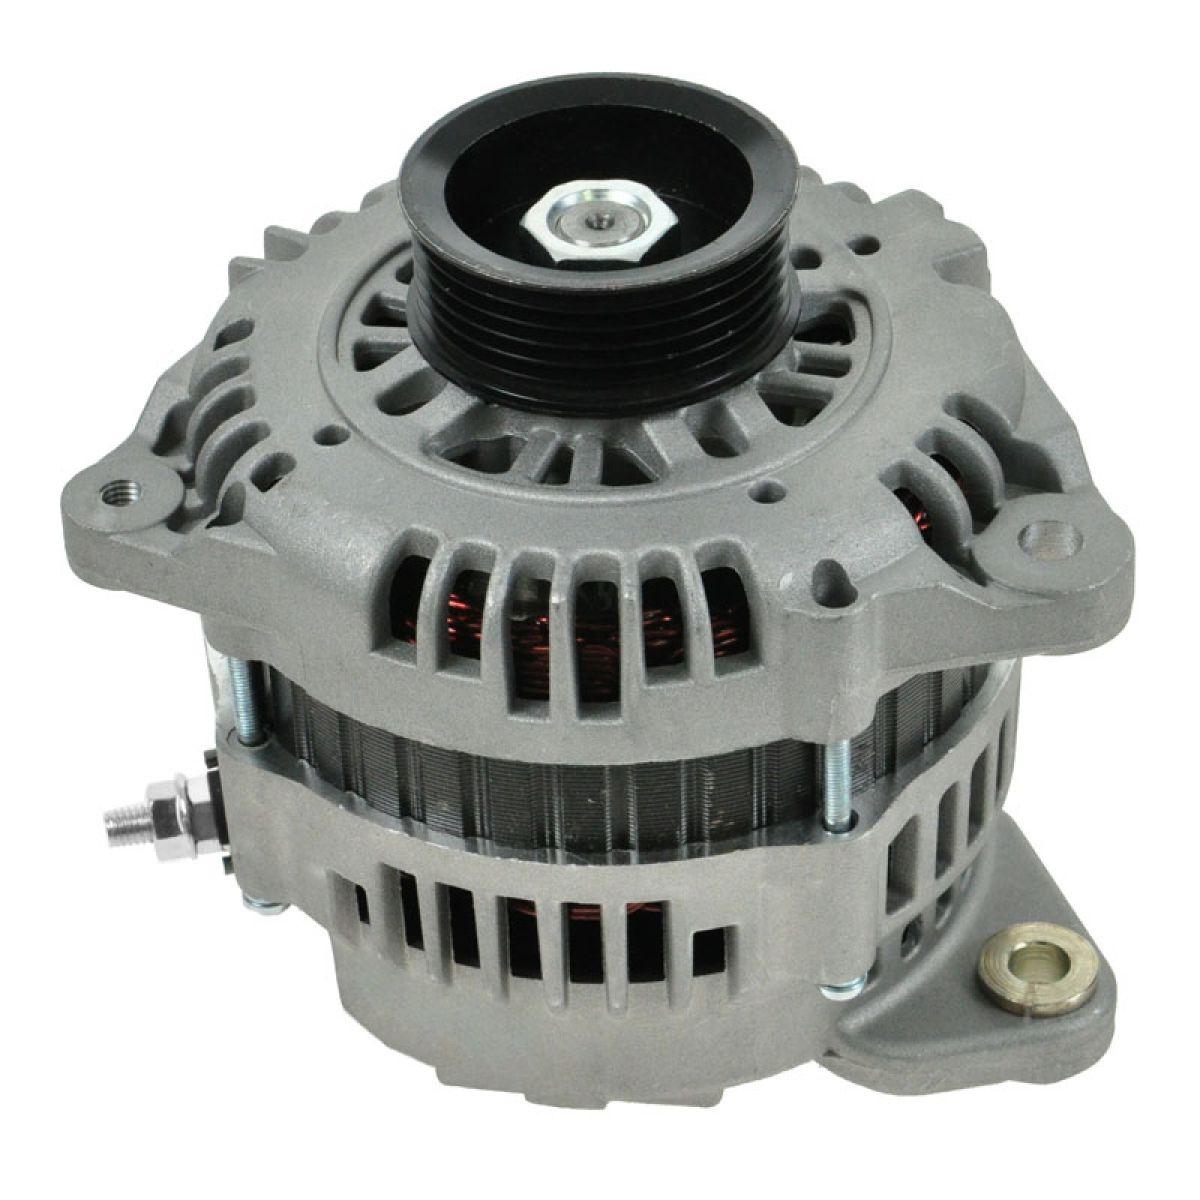 Alternator Generator 110 Amp Ampere For Nissan Maxima Murano Infiniti I30 I35